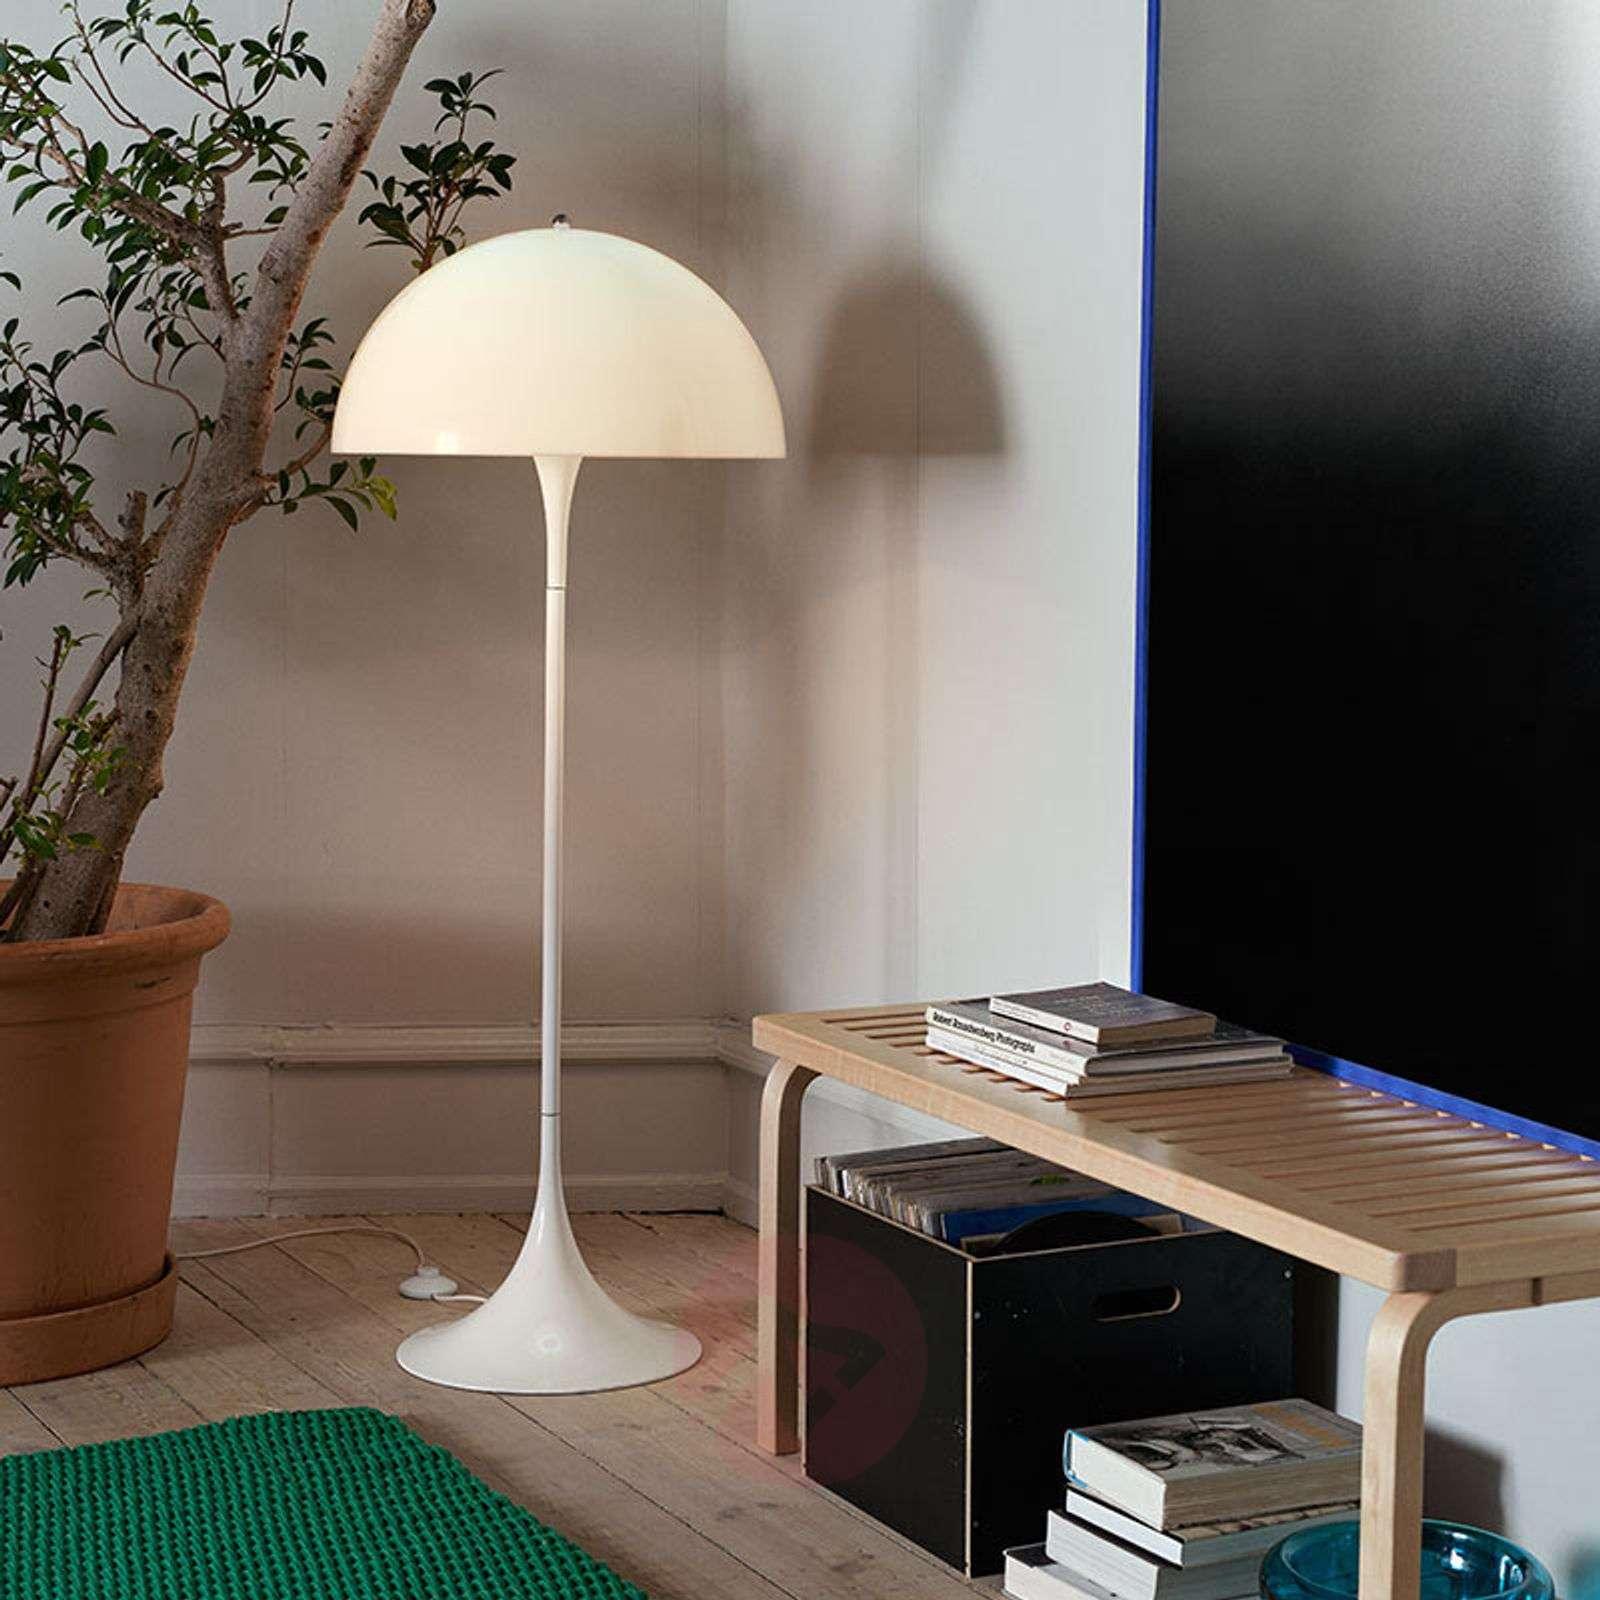 Louis Poulsen Panthella design-lattiavalo, opaali-6090105-01